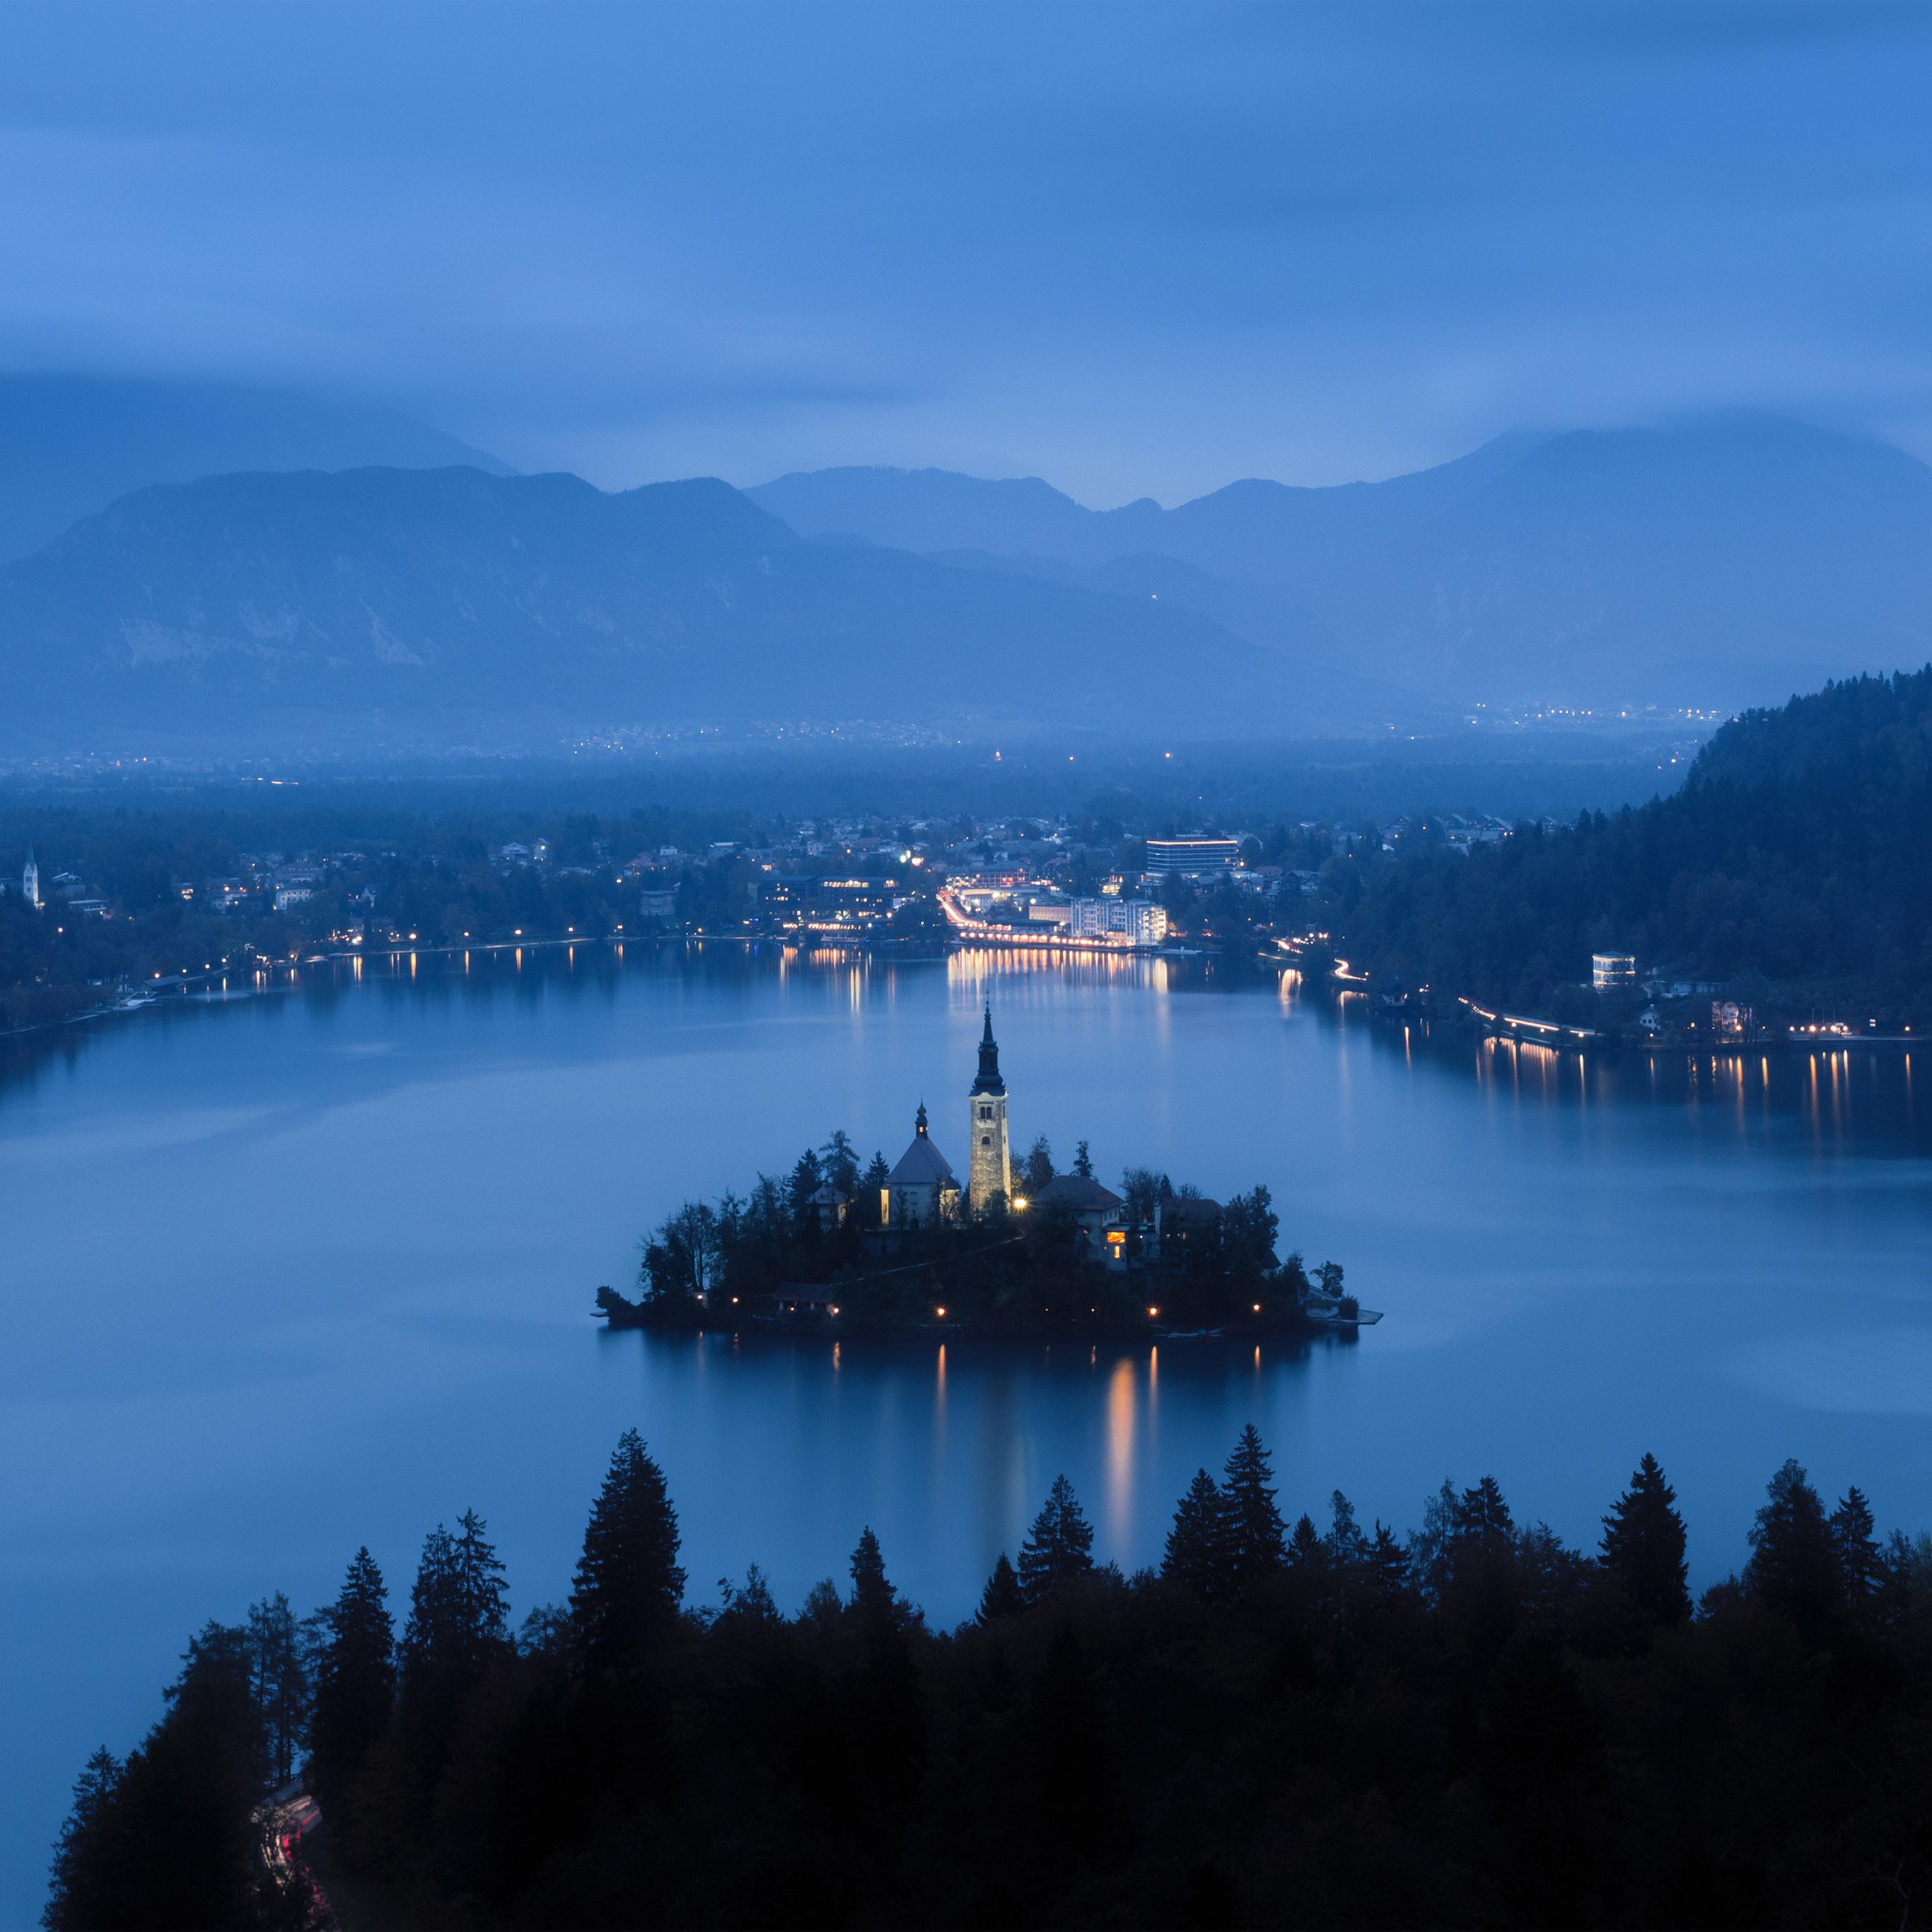 Nr24-lake-blue-night-mountain-country-nature-wallpaper